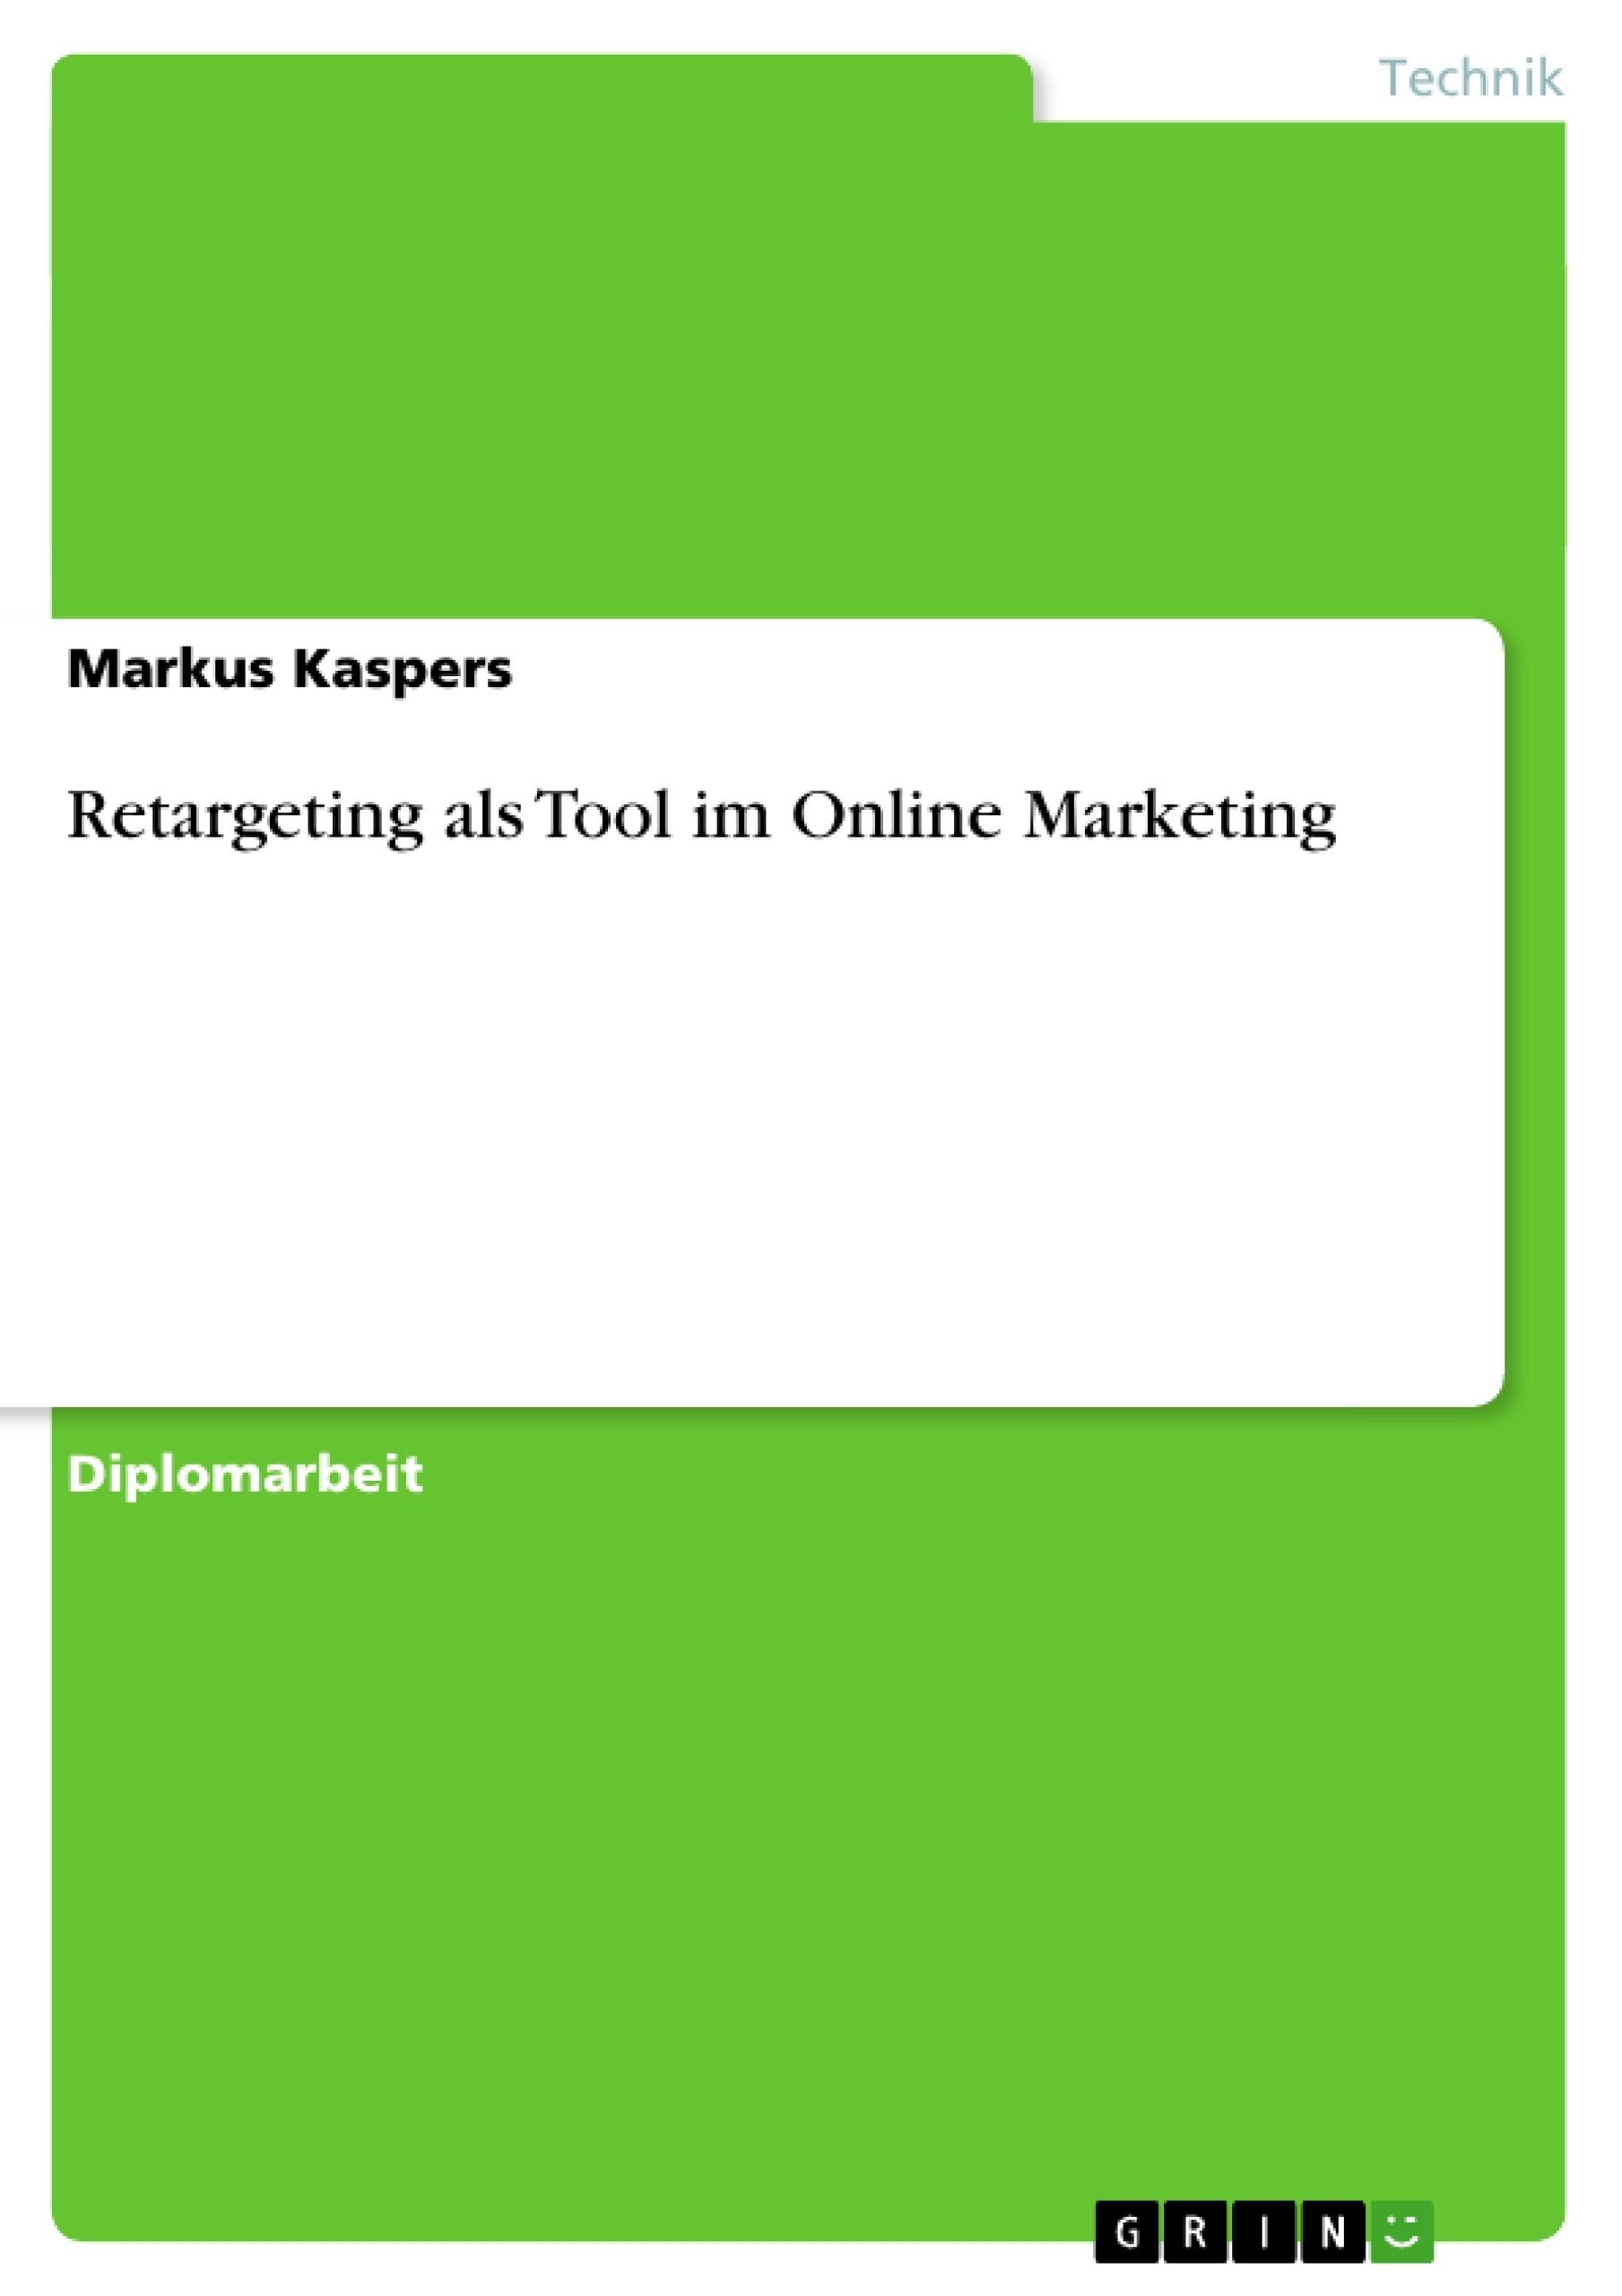 Titel: Retargeting als Tool im Online Marketing